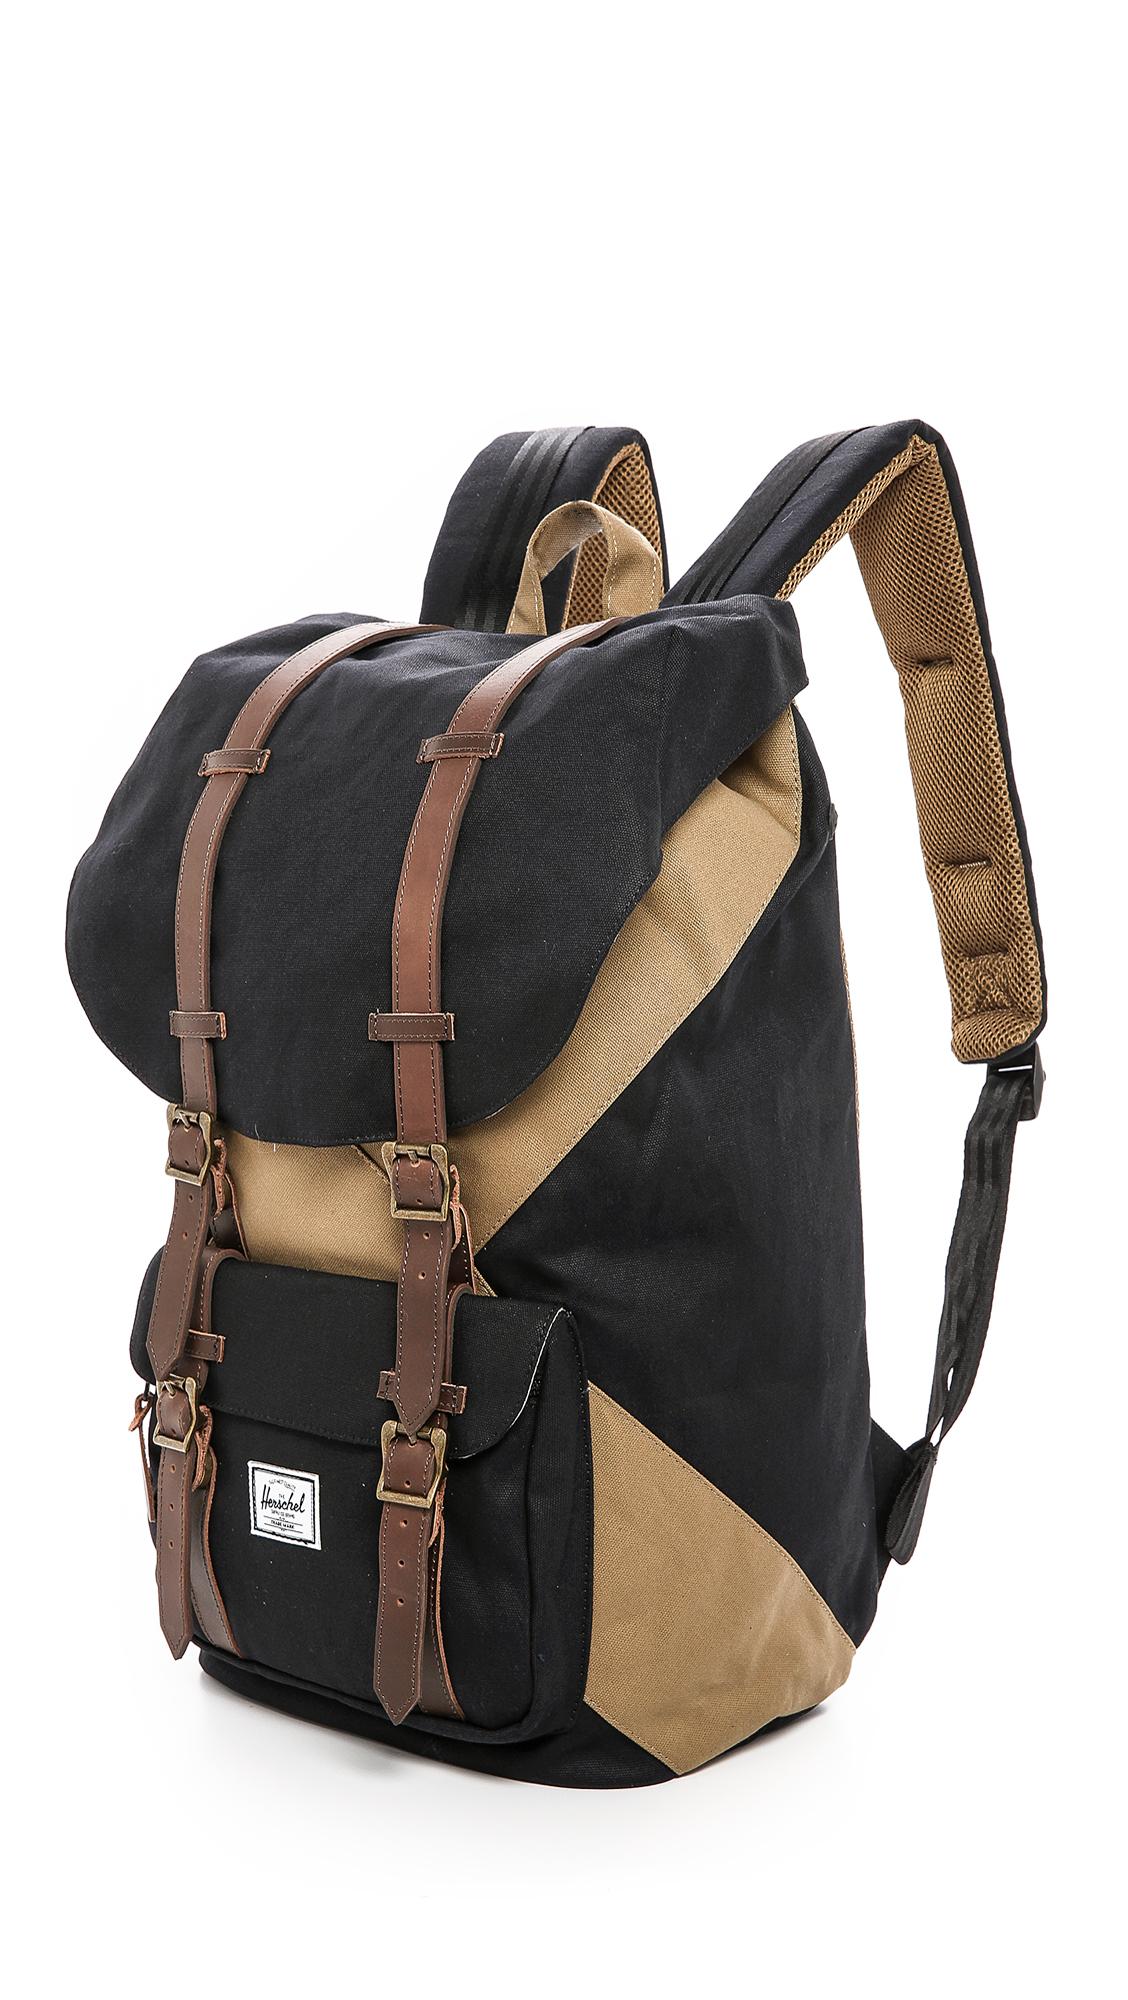 Herschel Supply Co. Little America Studio Backpack in Black/Sand (Black) for Men - Lyst